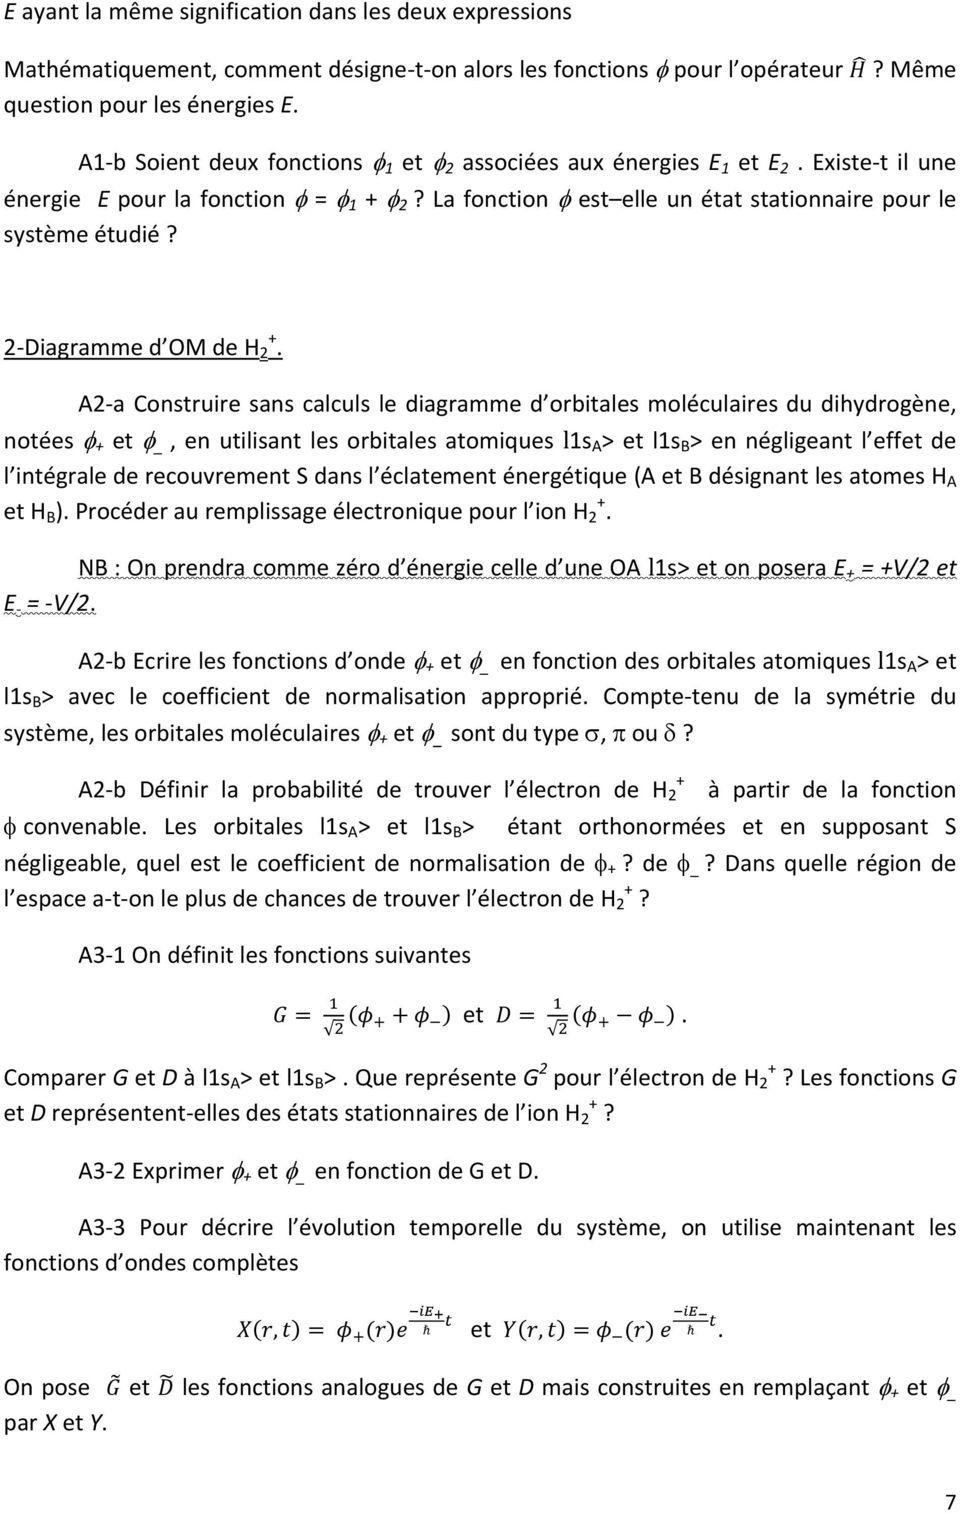 hight resolution of 2 diagramme d om de h 2